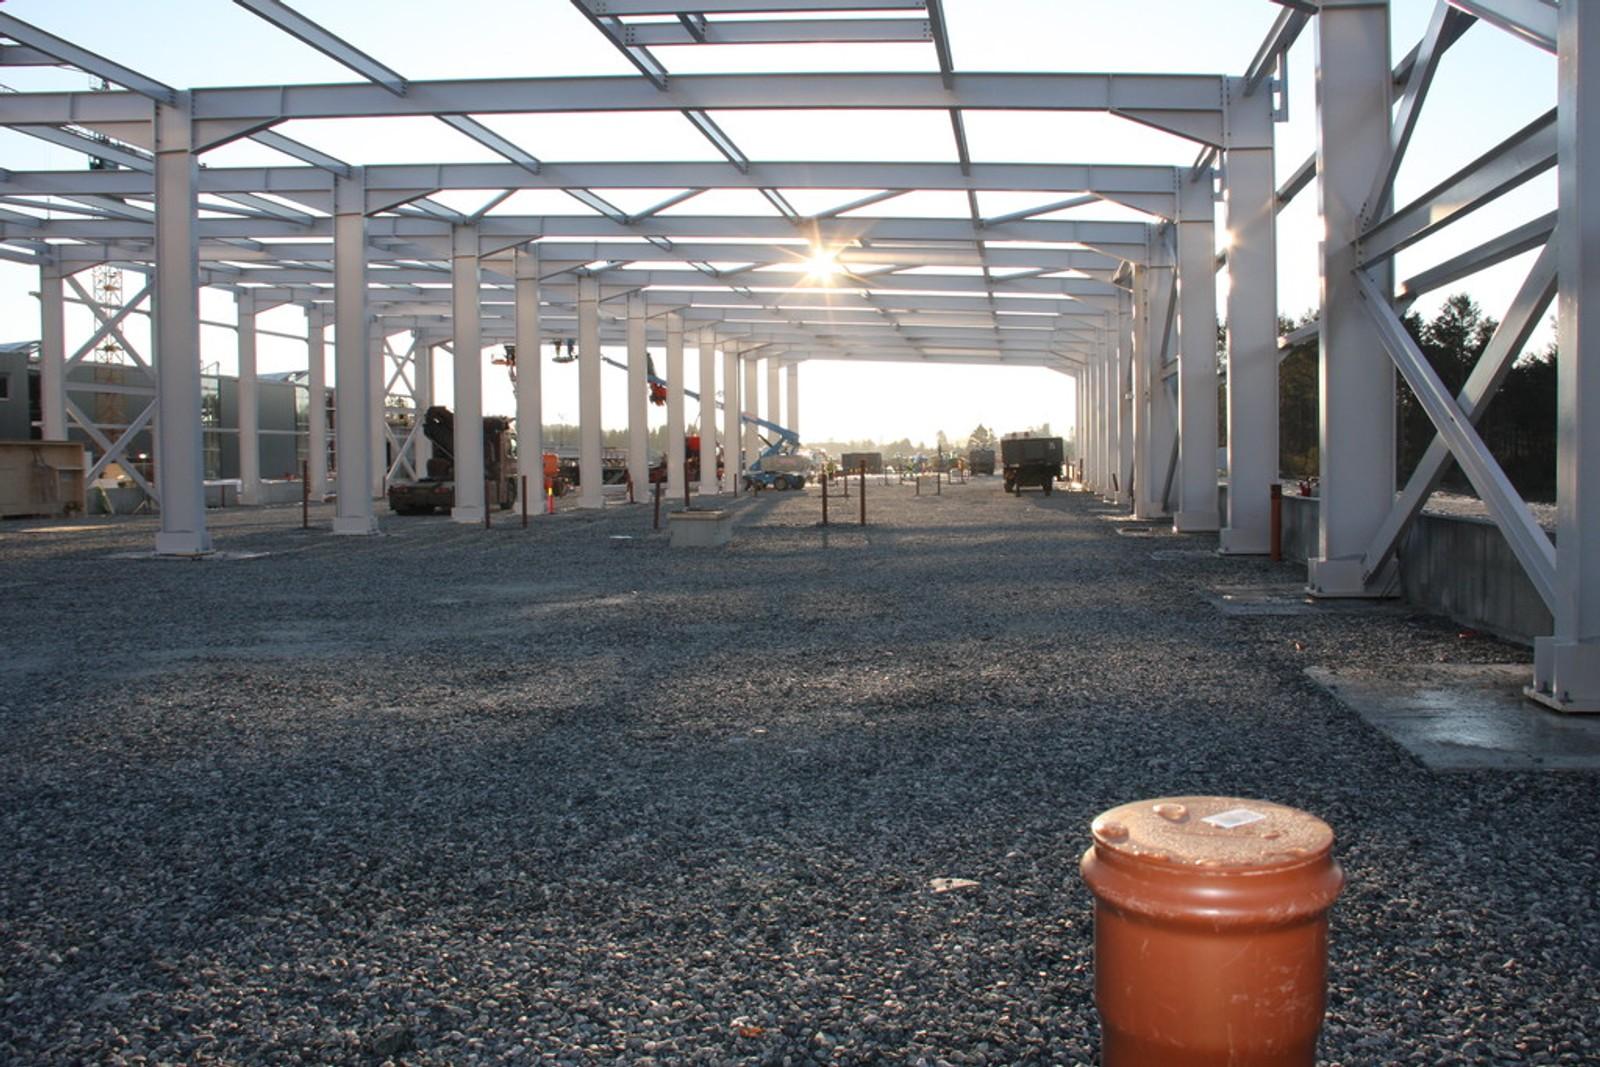 300 METER LANG: Vognhallen får plass til åtte bybanevogner side om side. Med sine 300 meter i lengden og 30 meter i bredden blir dette Bergens største bygg i flateareal.